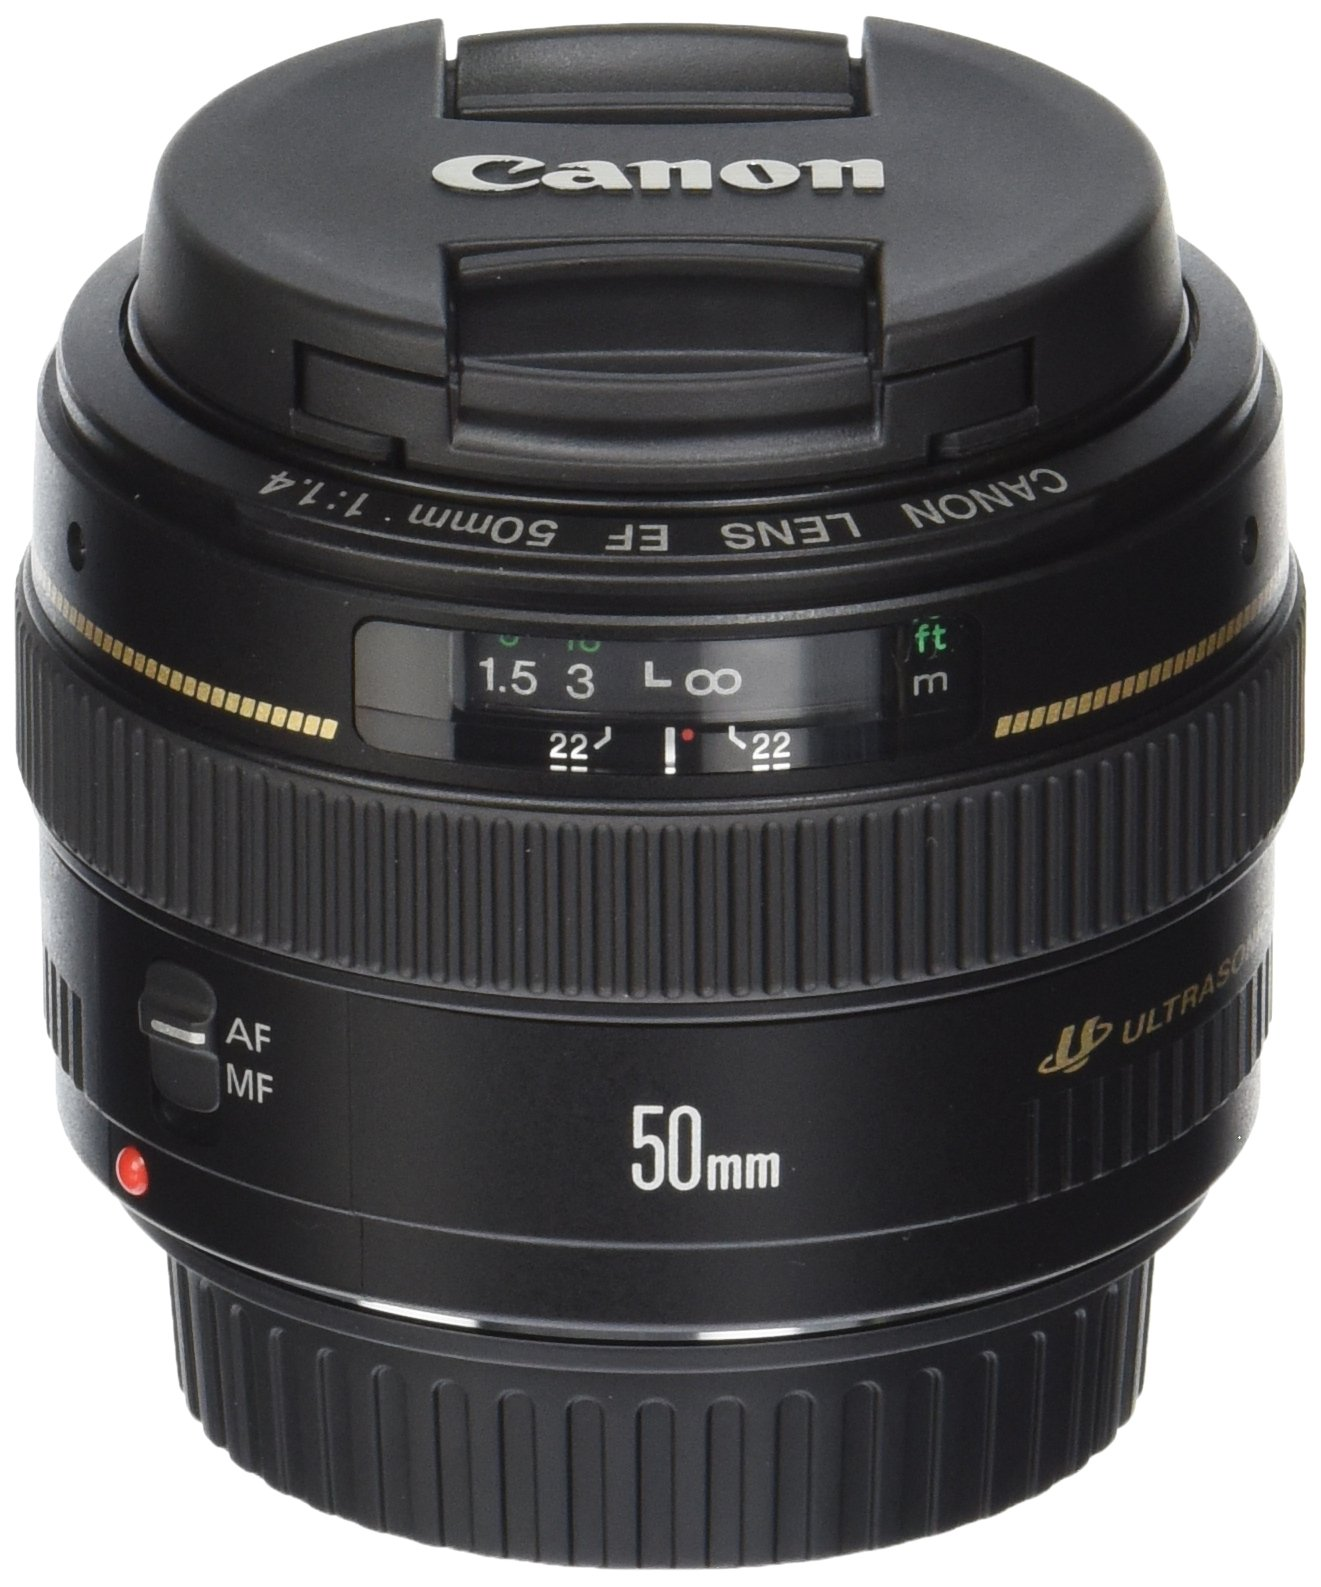 Canon EF 50mm f/1.4 USM Standard & Medium Telephoto Lens for Canon SLR Cameras